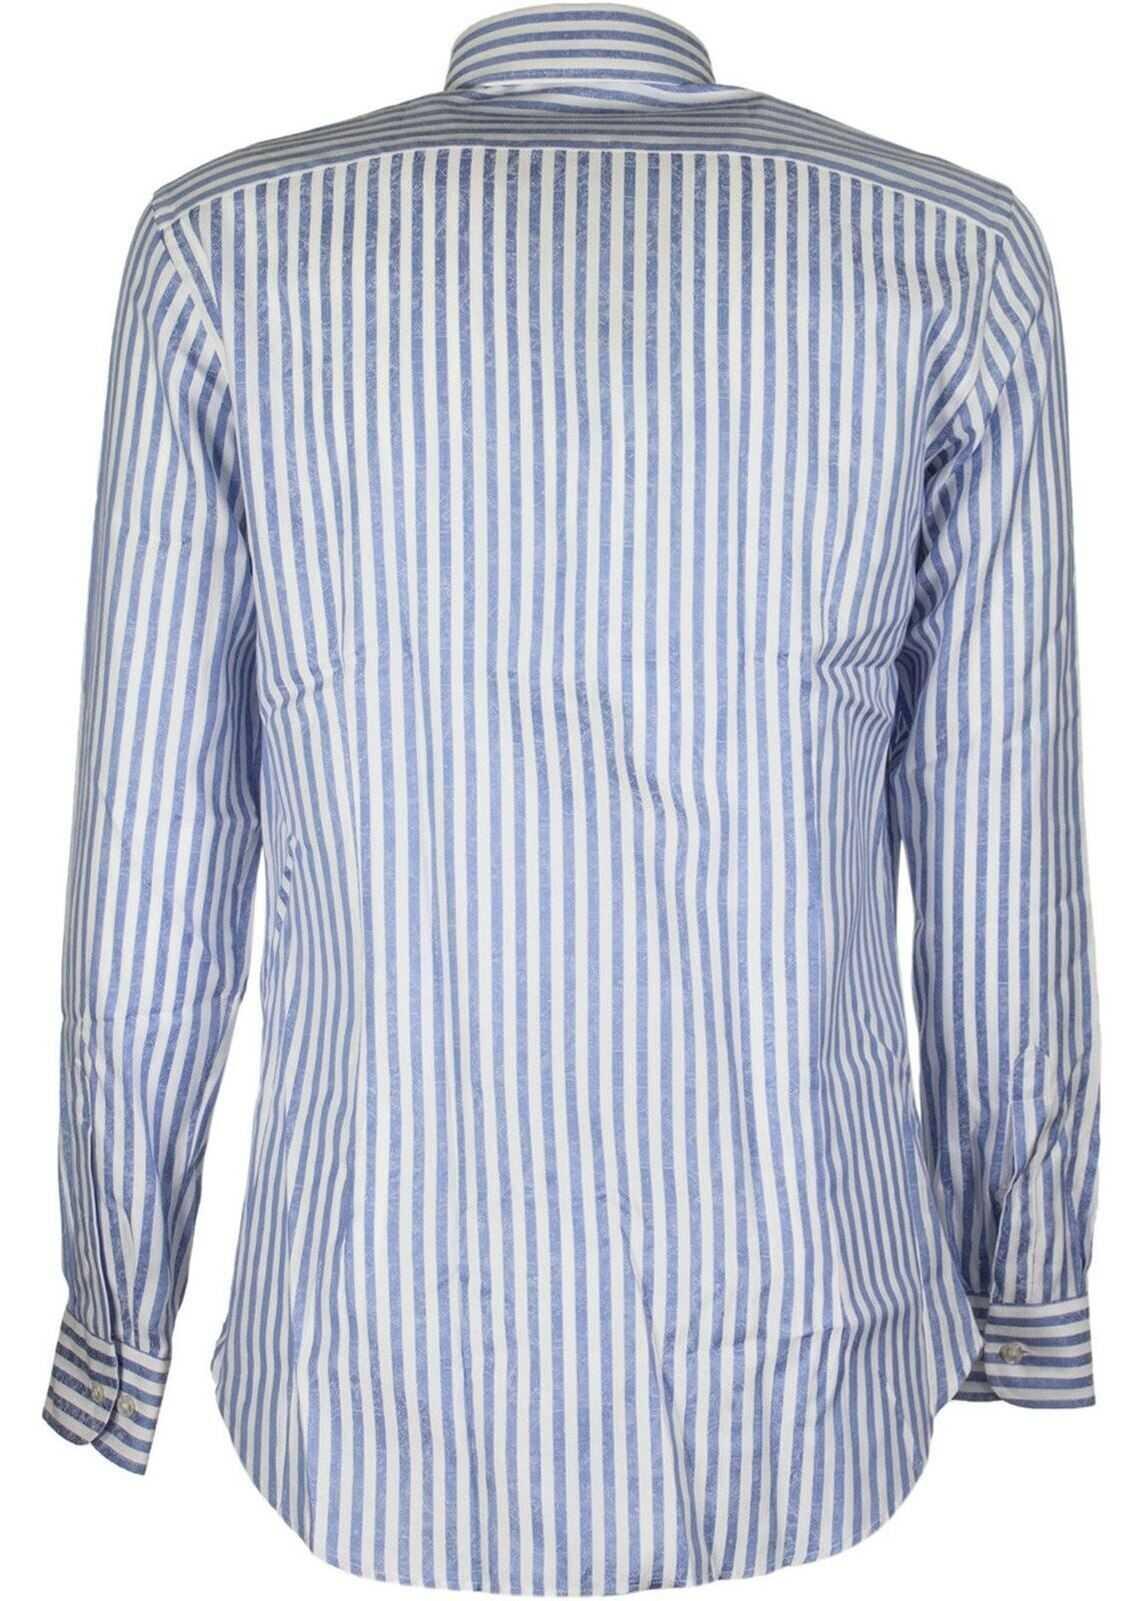 ETRO Striped Button Down Collar Shirt Light Blue imagine